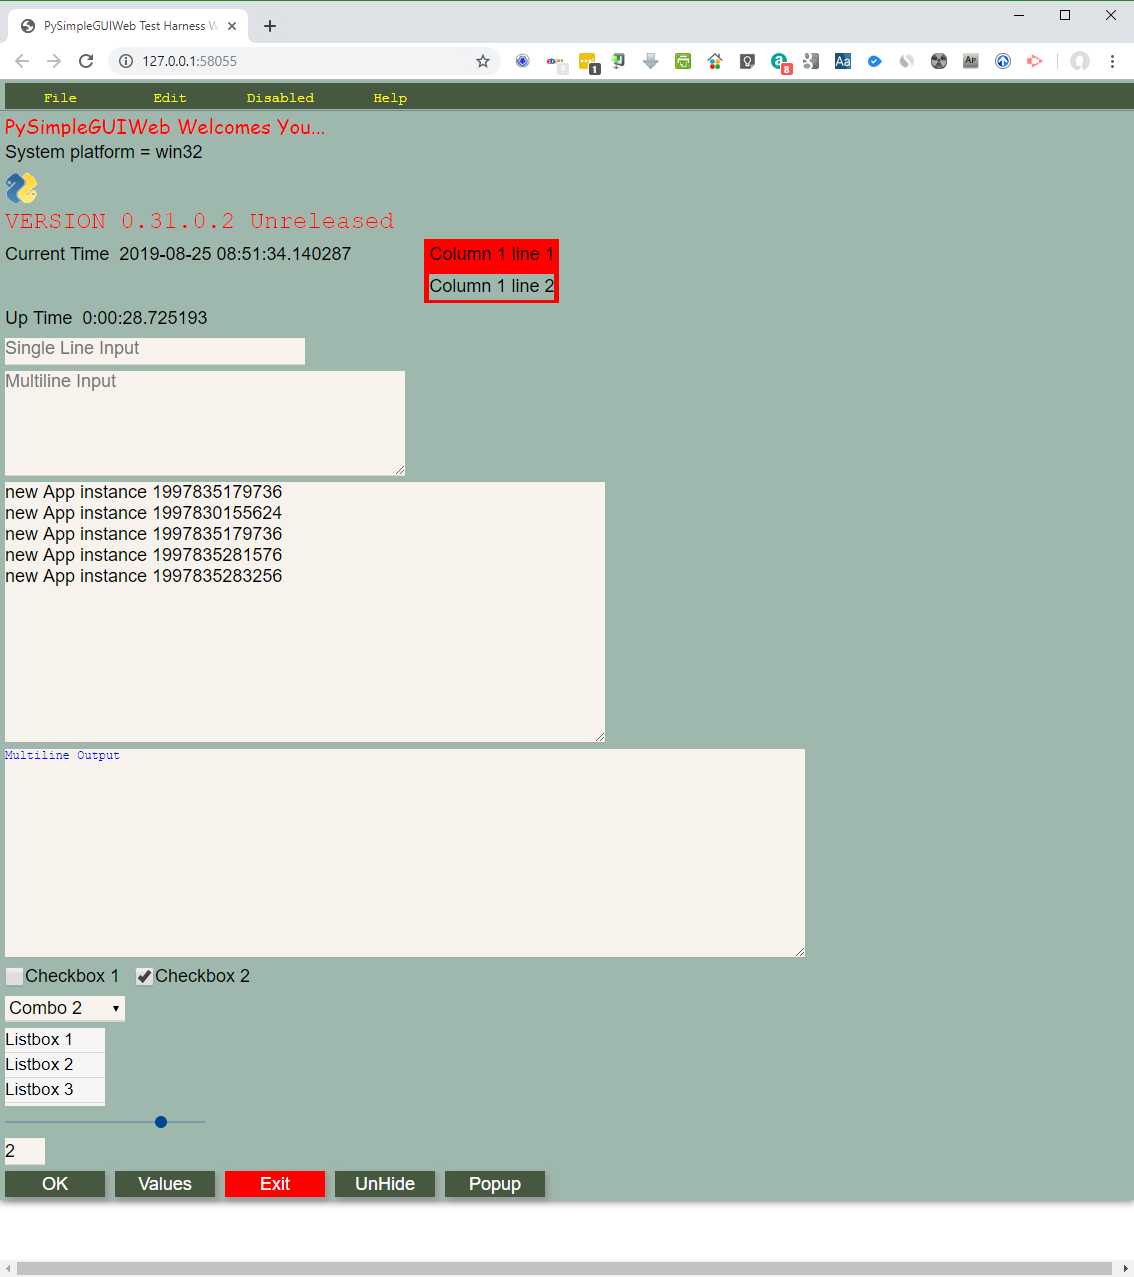 PySimpleGUI/PySimpleGUIWeb at master · PySimpleGUI